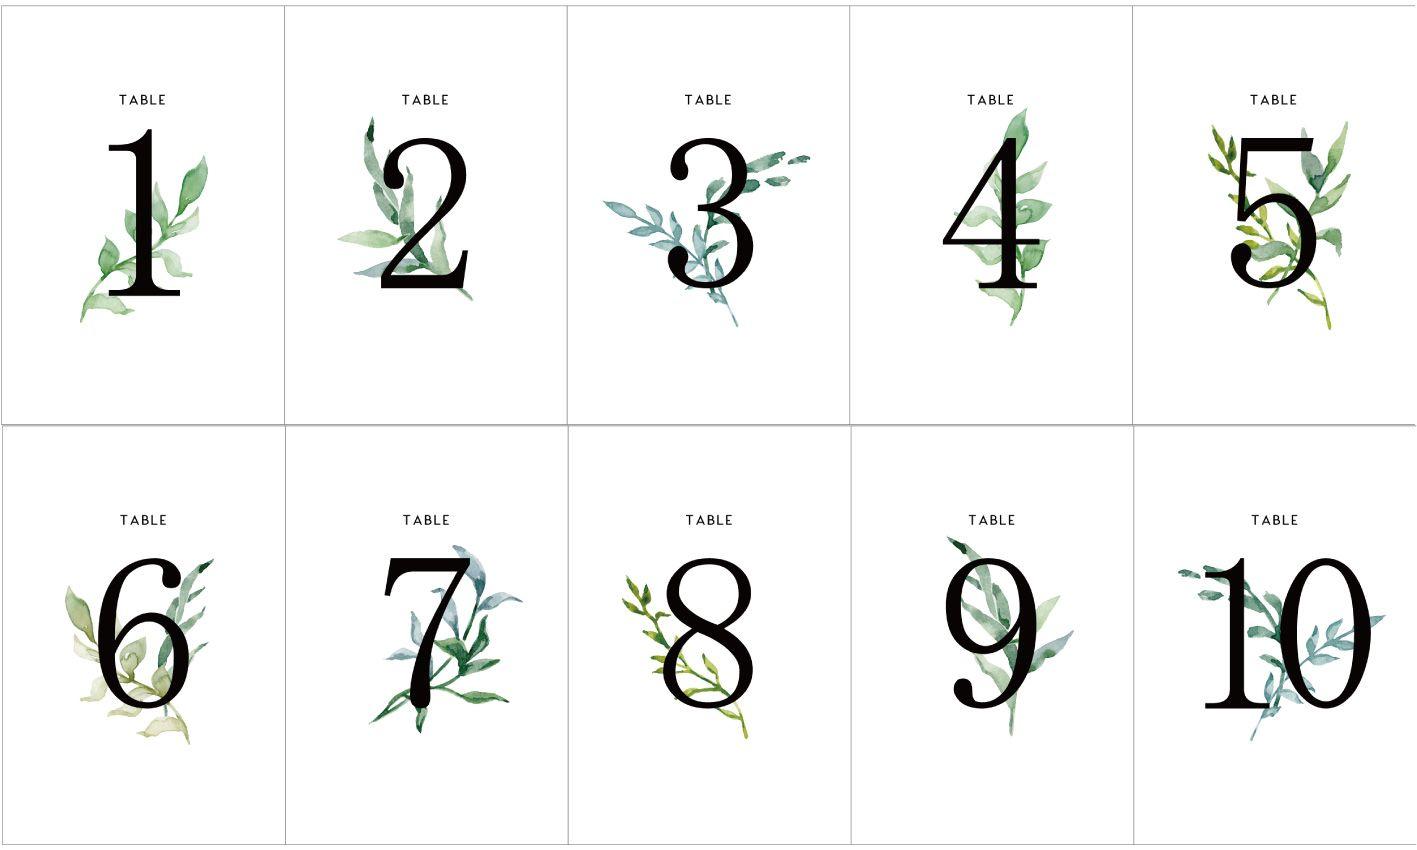 Phpスペシャル2月号 Illustration Animal イラスト 数字 数字 フォント かわいい フォント かわいい 数字 デザイン